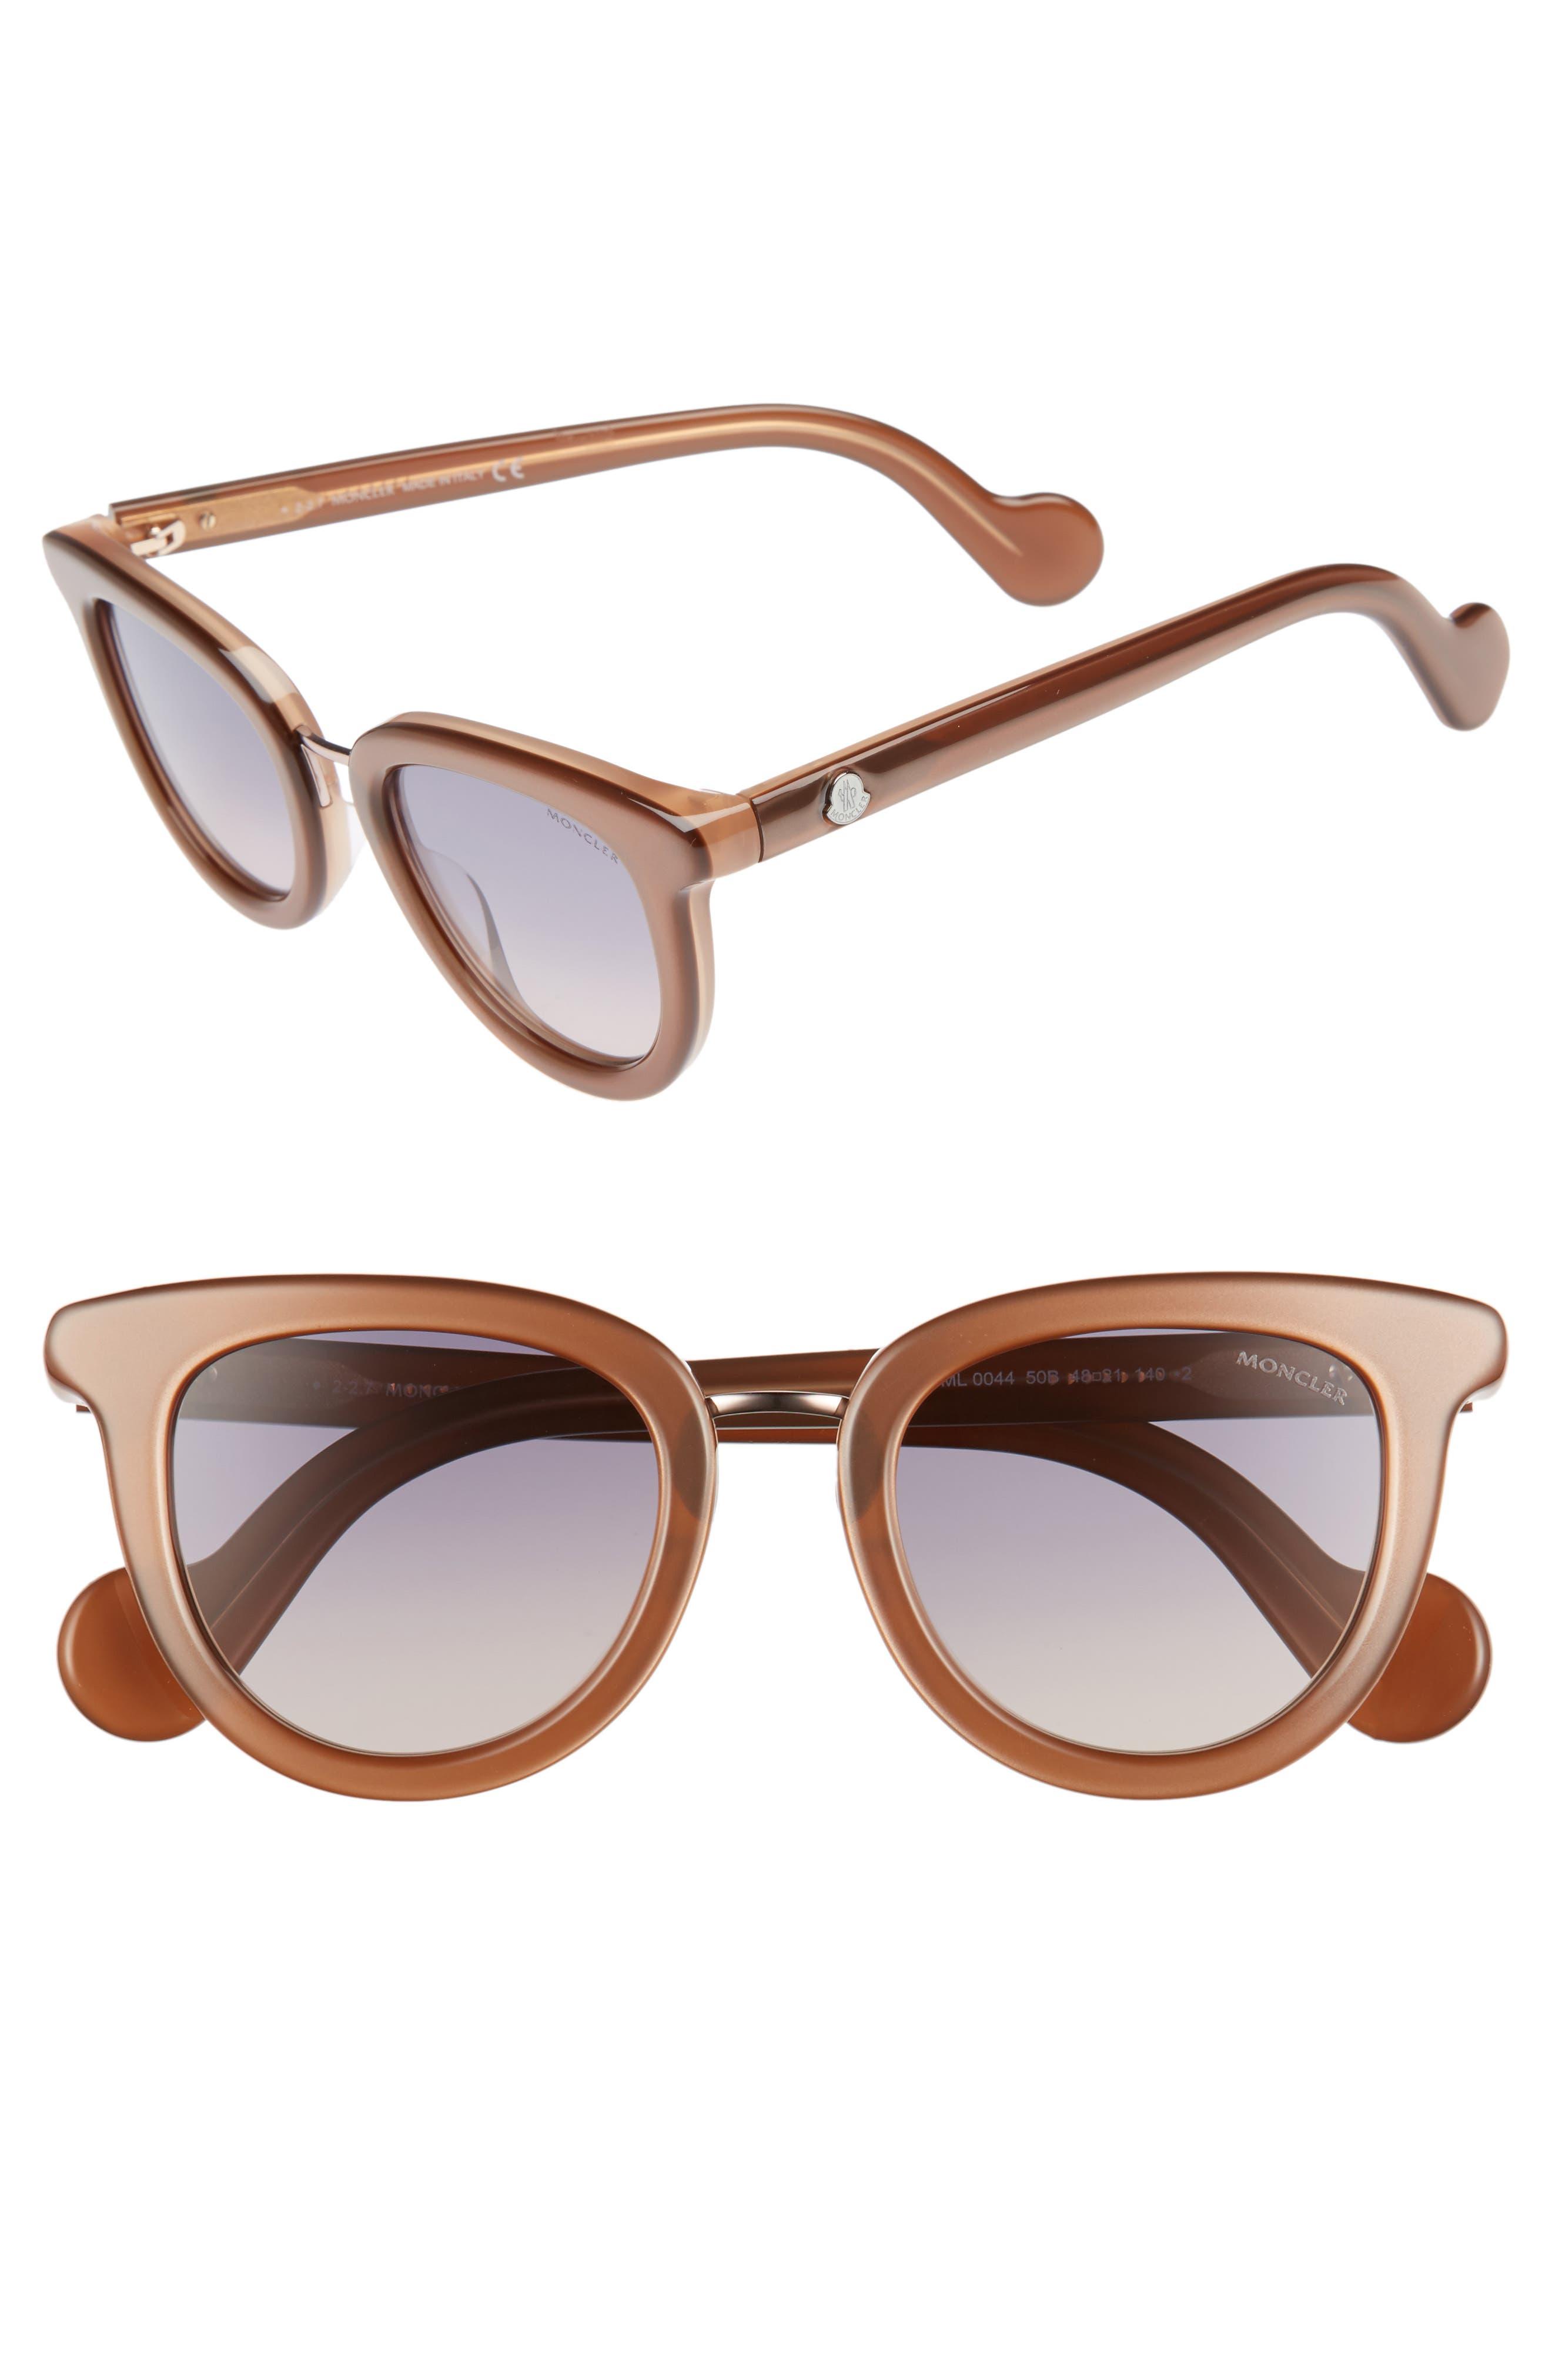 MONCLER 48mm Cat Eye Sunglasses, Main, color, PEARL BROWN/ GREY/ SAND